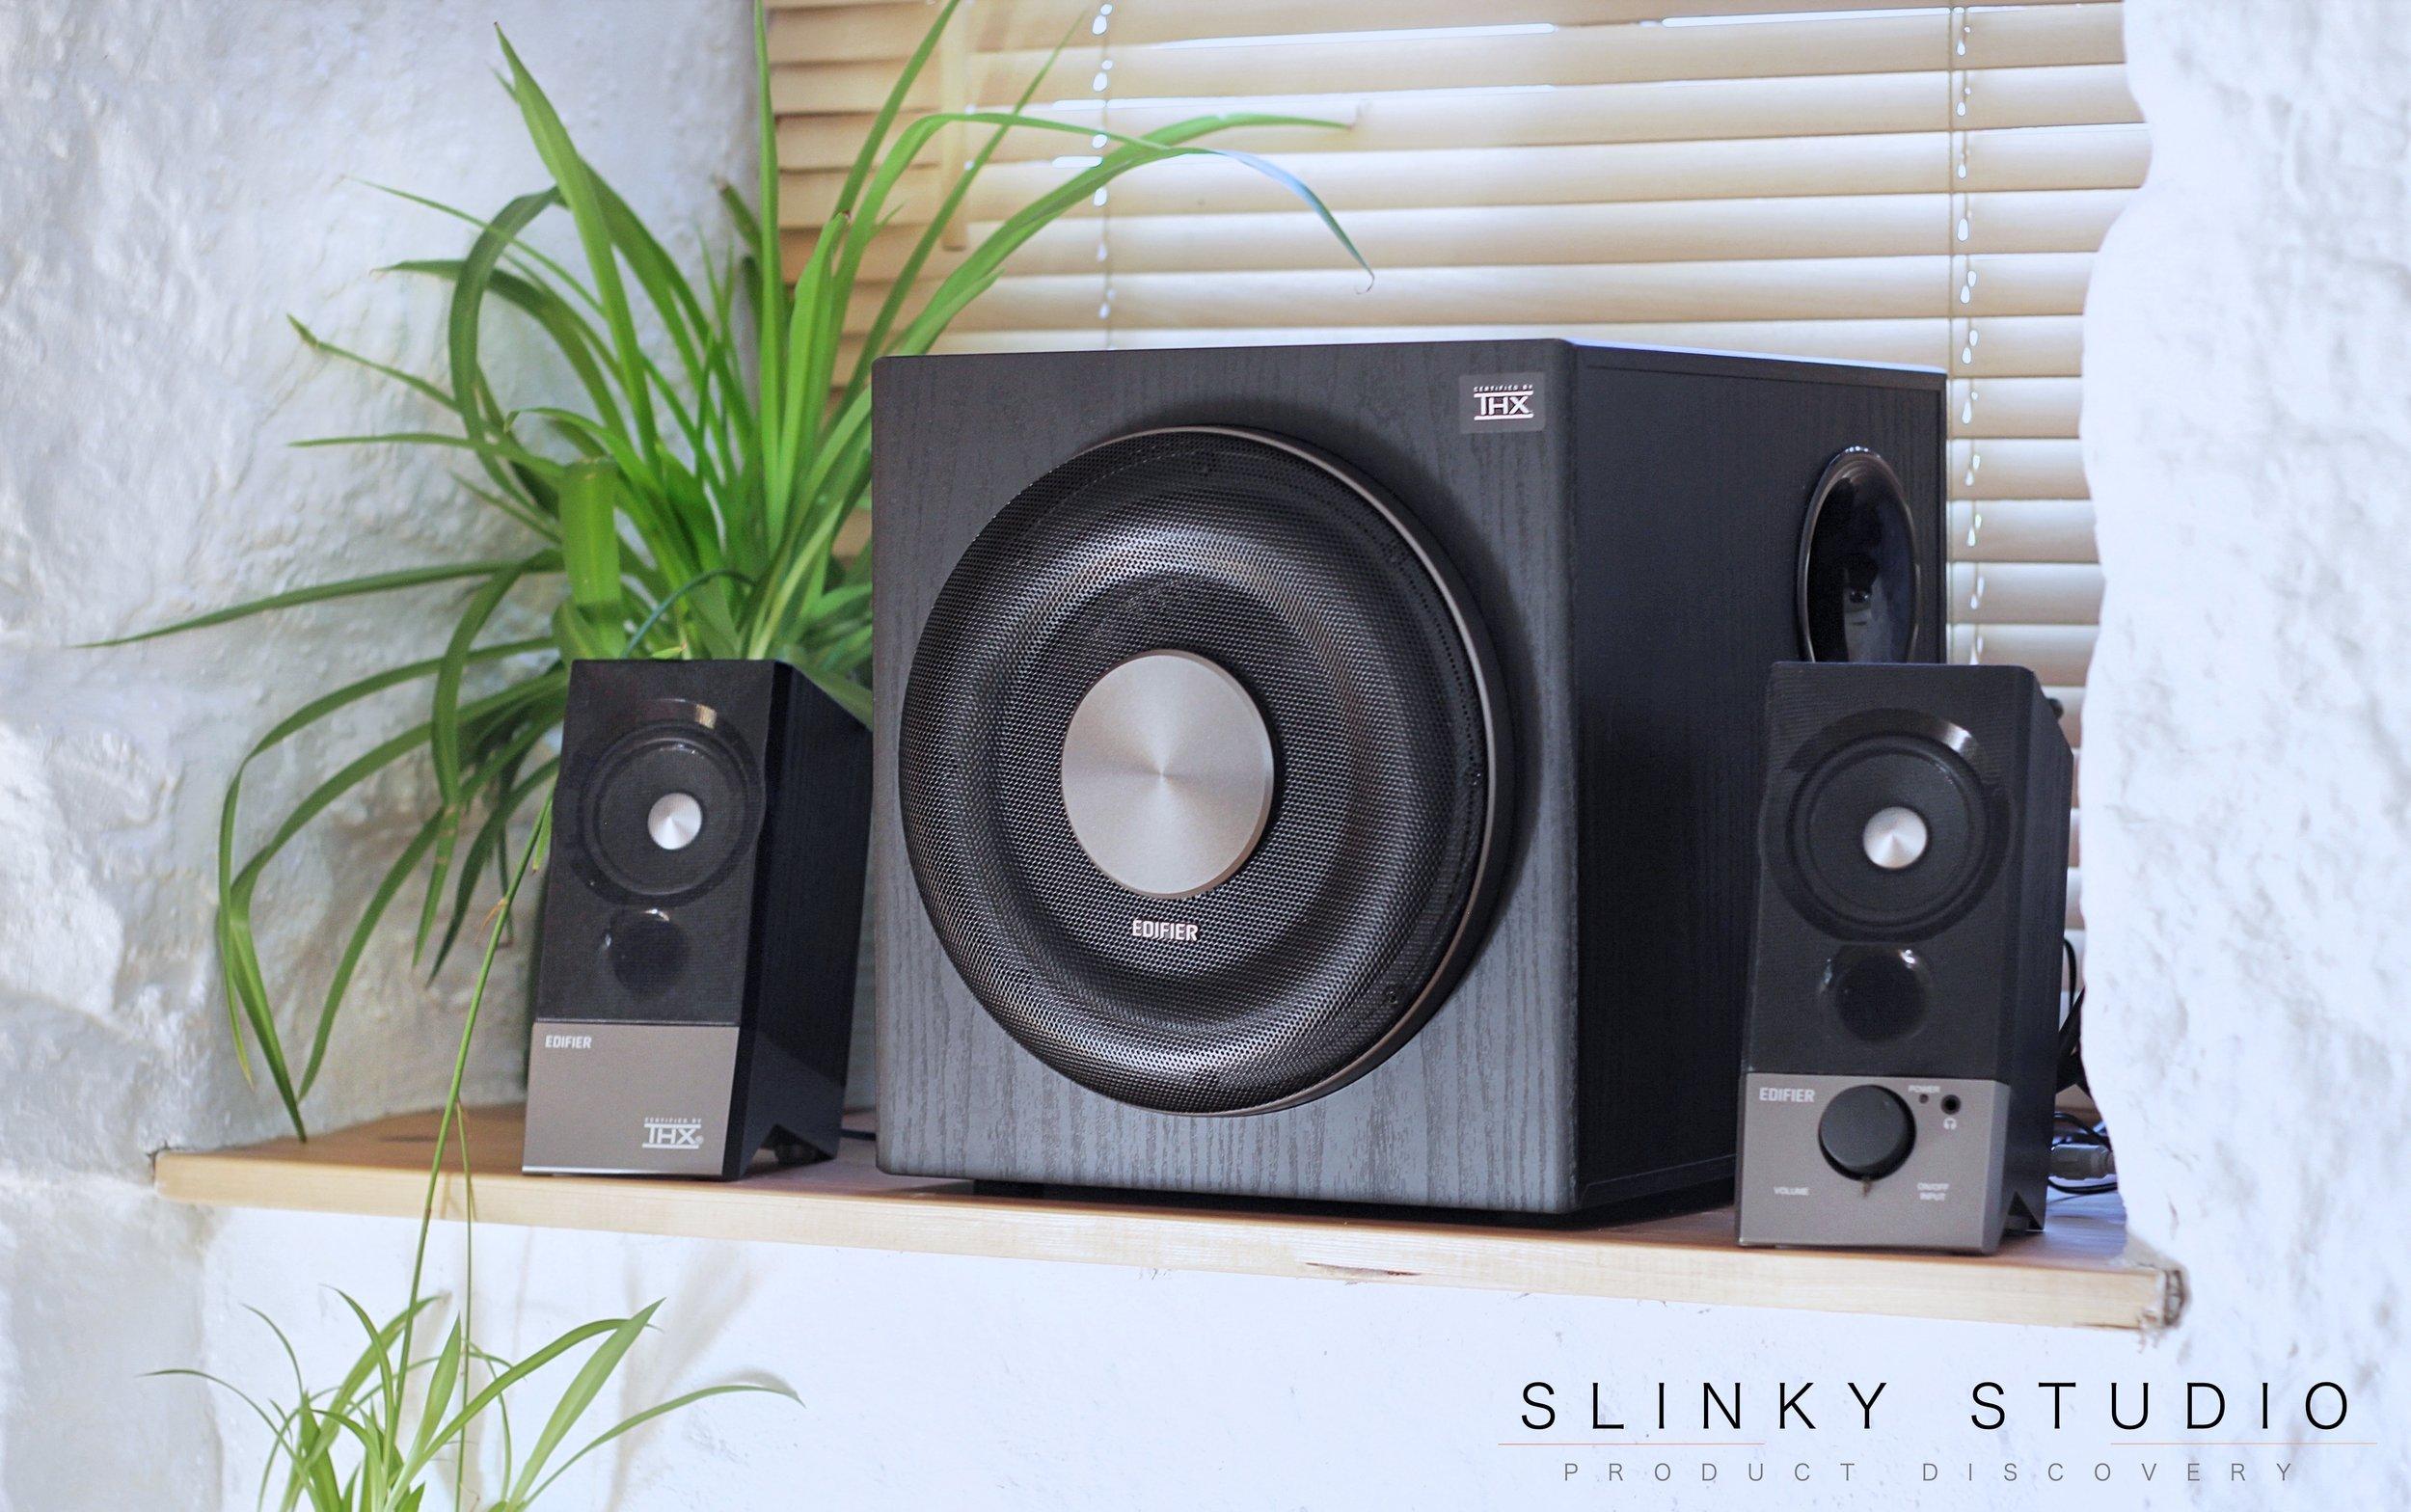 Edifier M3600D Speakers Review - Slinky Studio